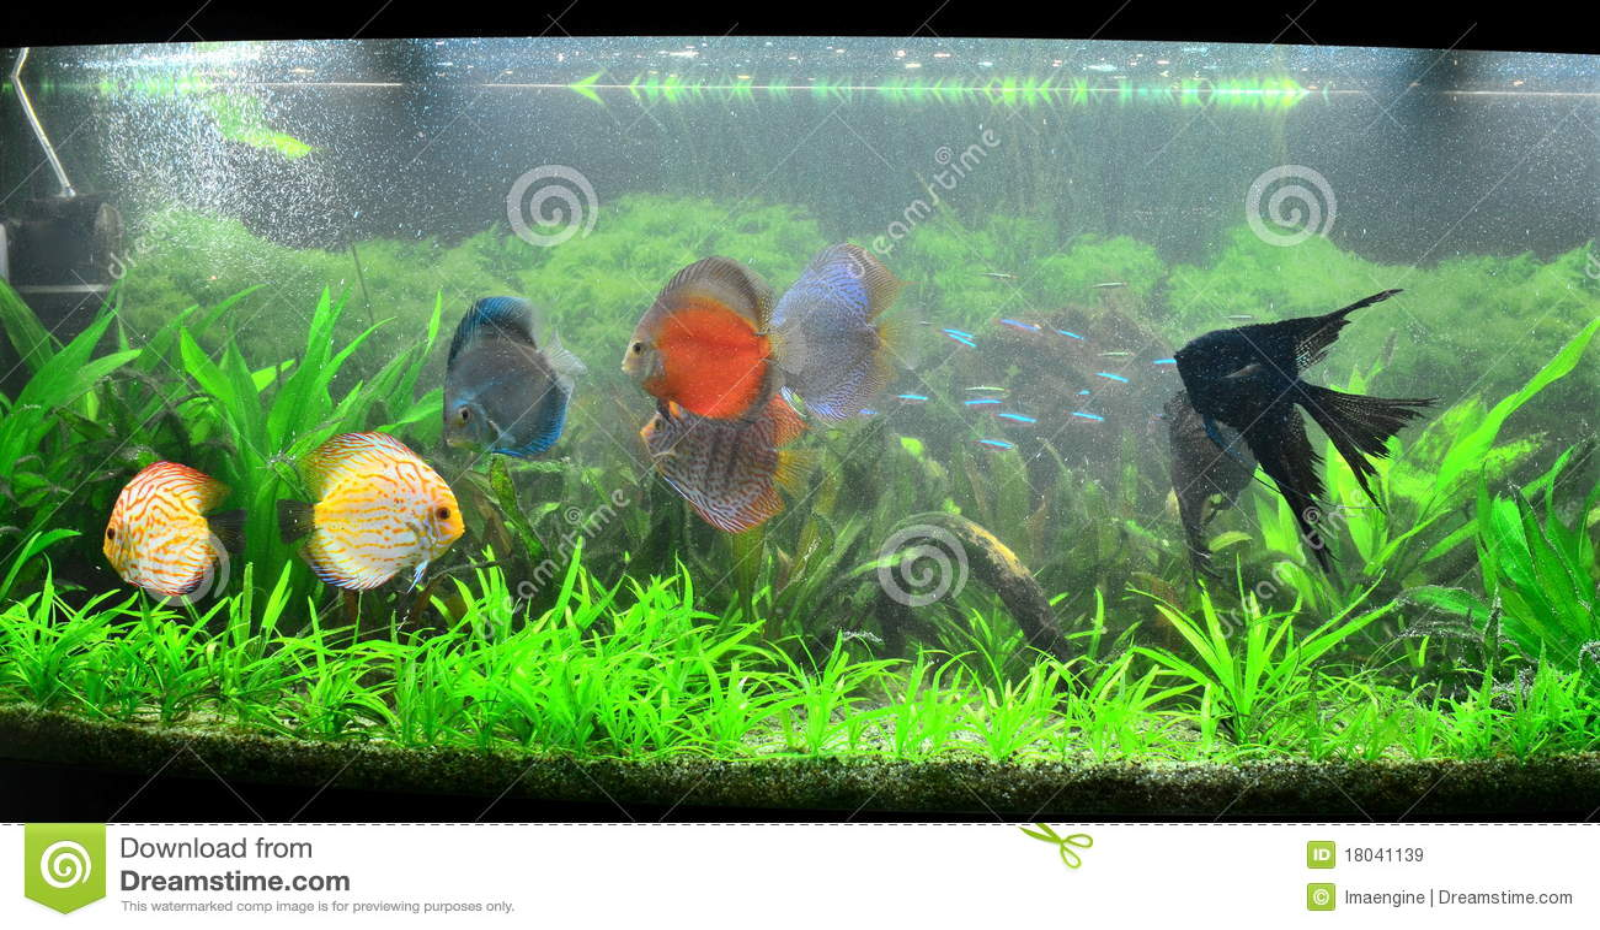 Freshwater aquarium fish exotic - Exotic Fish Tank Amazonian Aquarium Royalty Free Stock Images